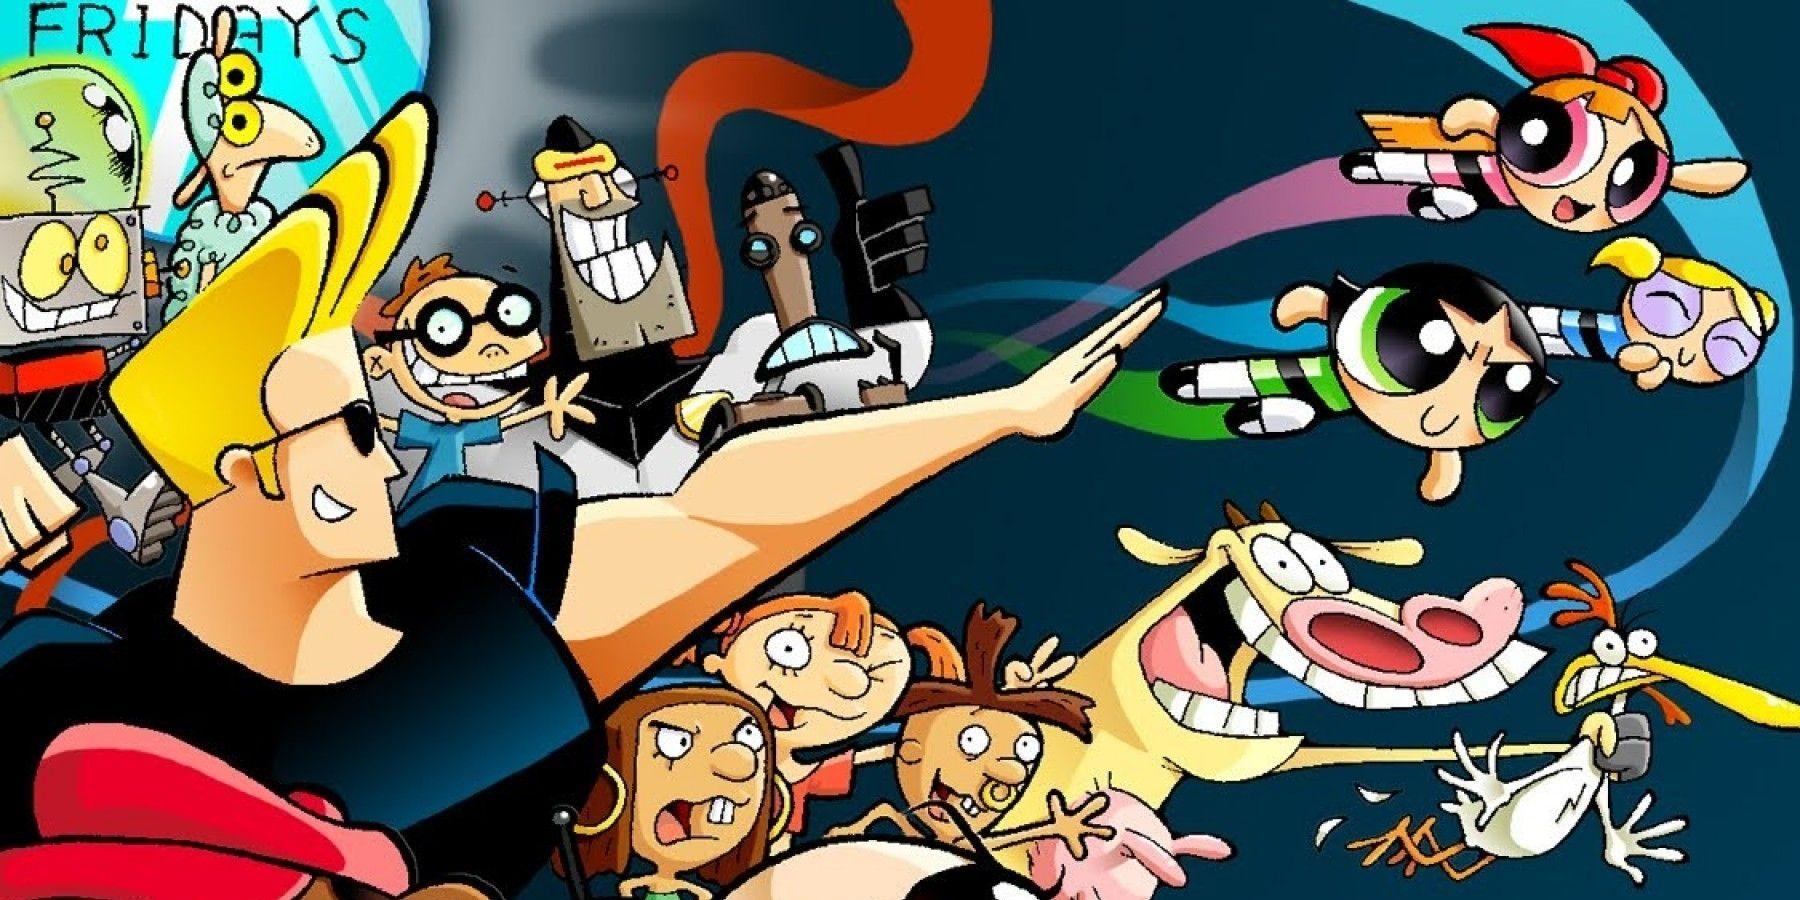 15 Forgotten Cartoons That Need Movie Adaptations | ScreenRant